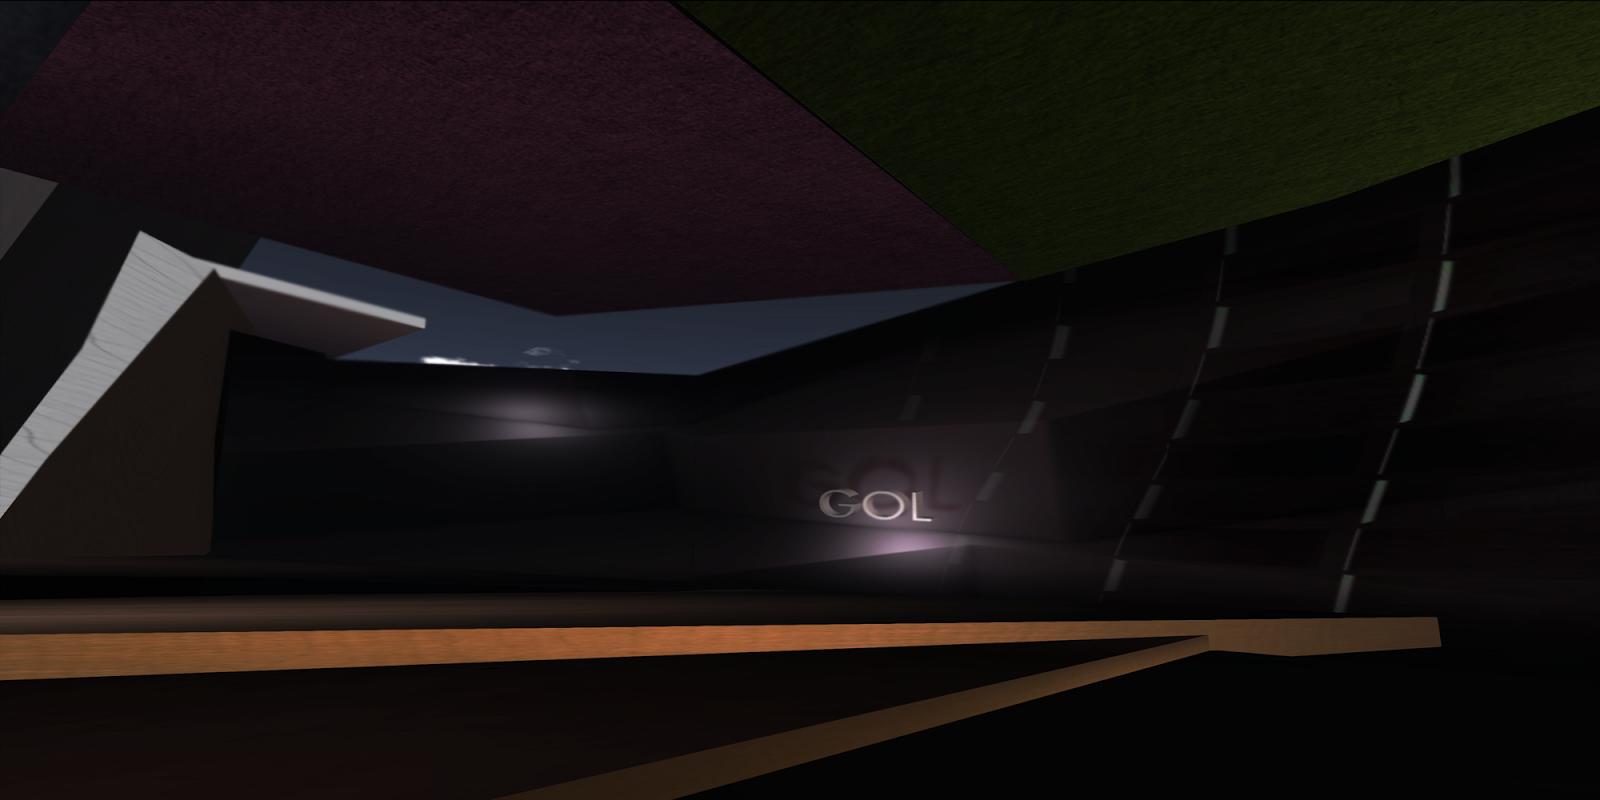 Gol , the 9th